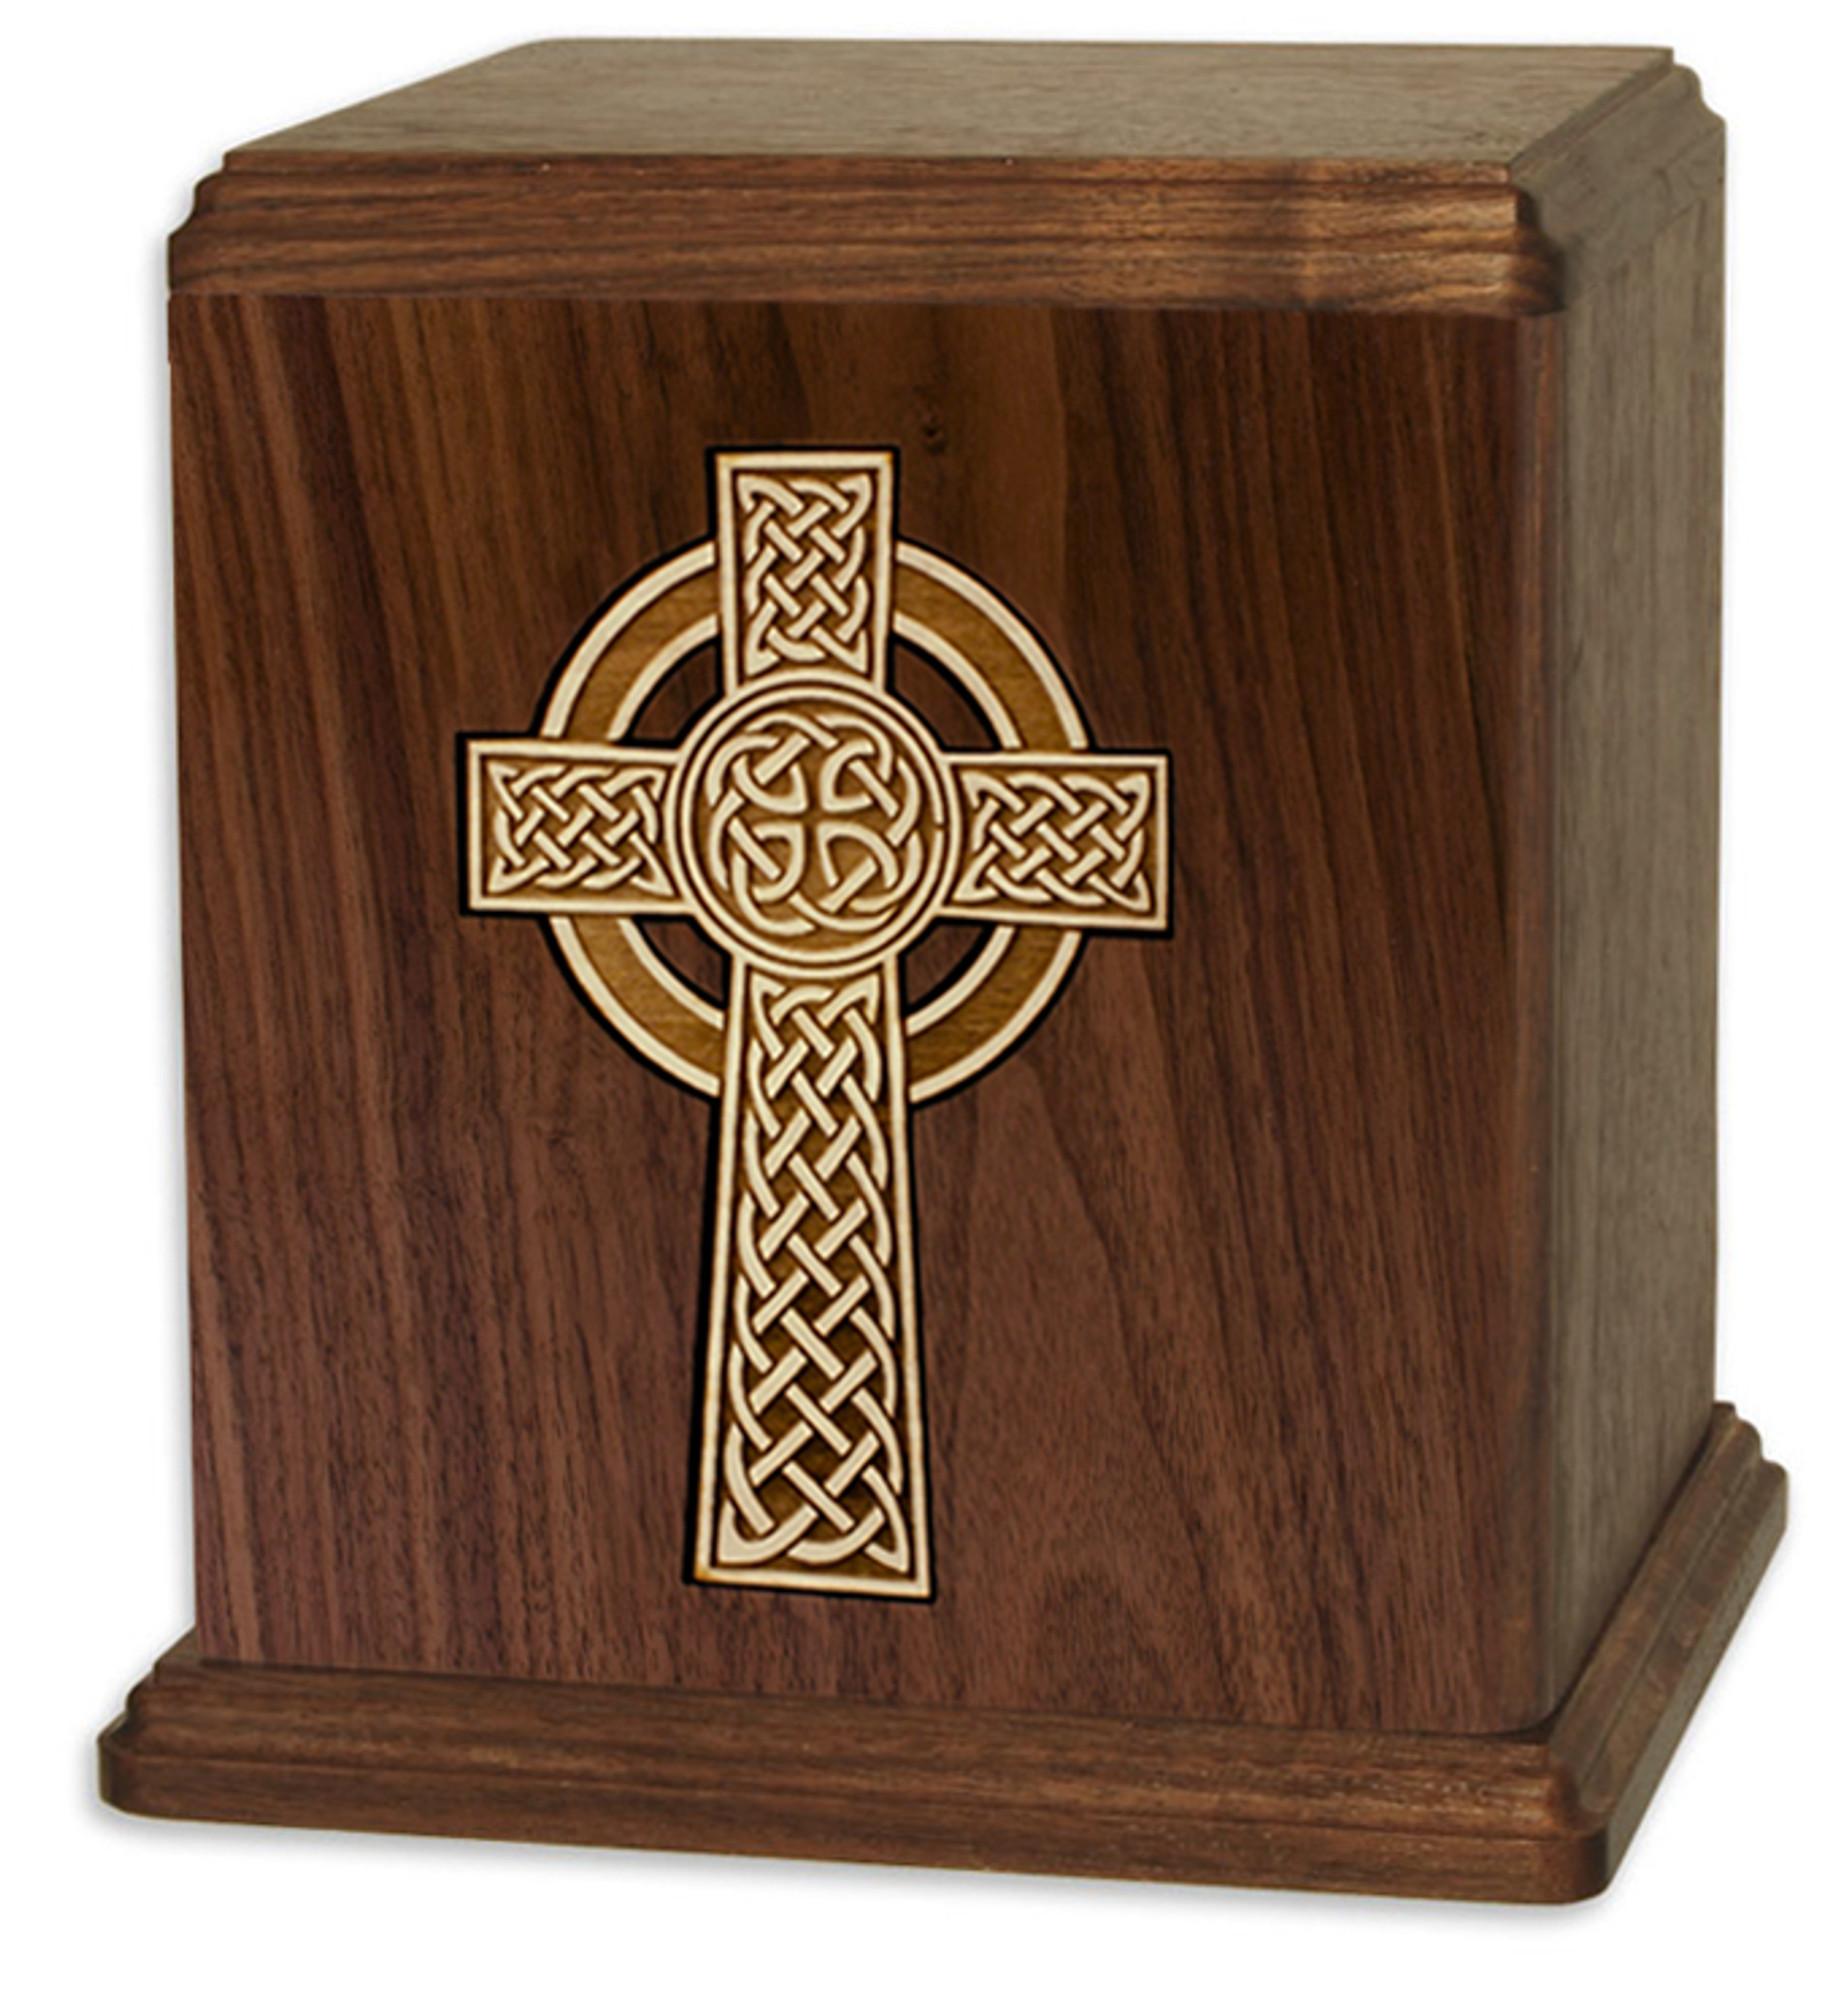 Walnut Wood Cremation Urn With Celtic Cross Inlay Urns Northwest